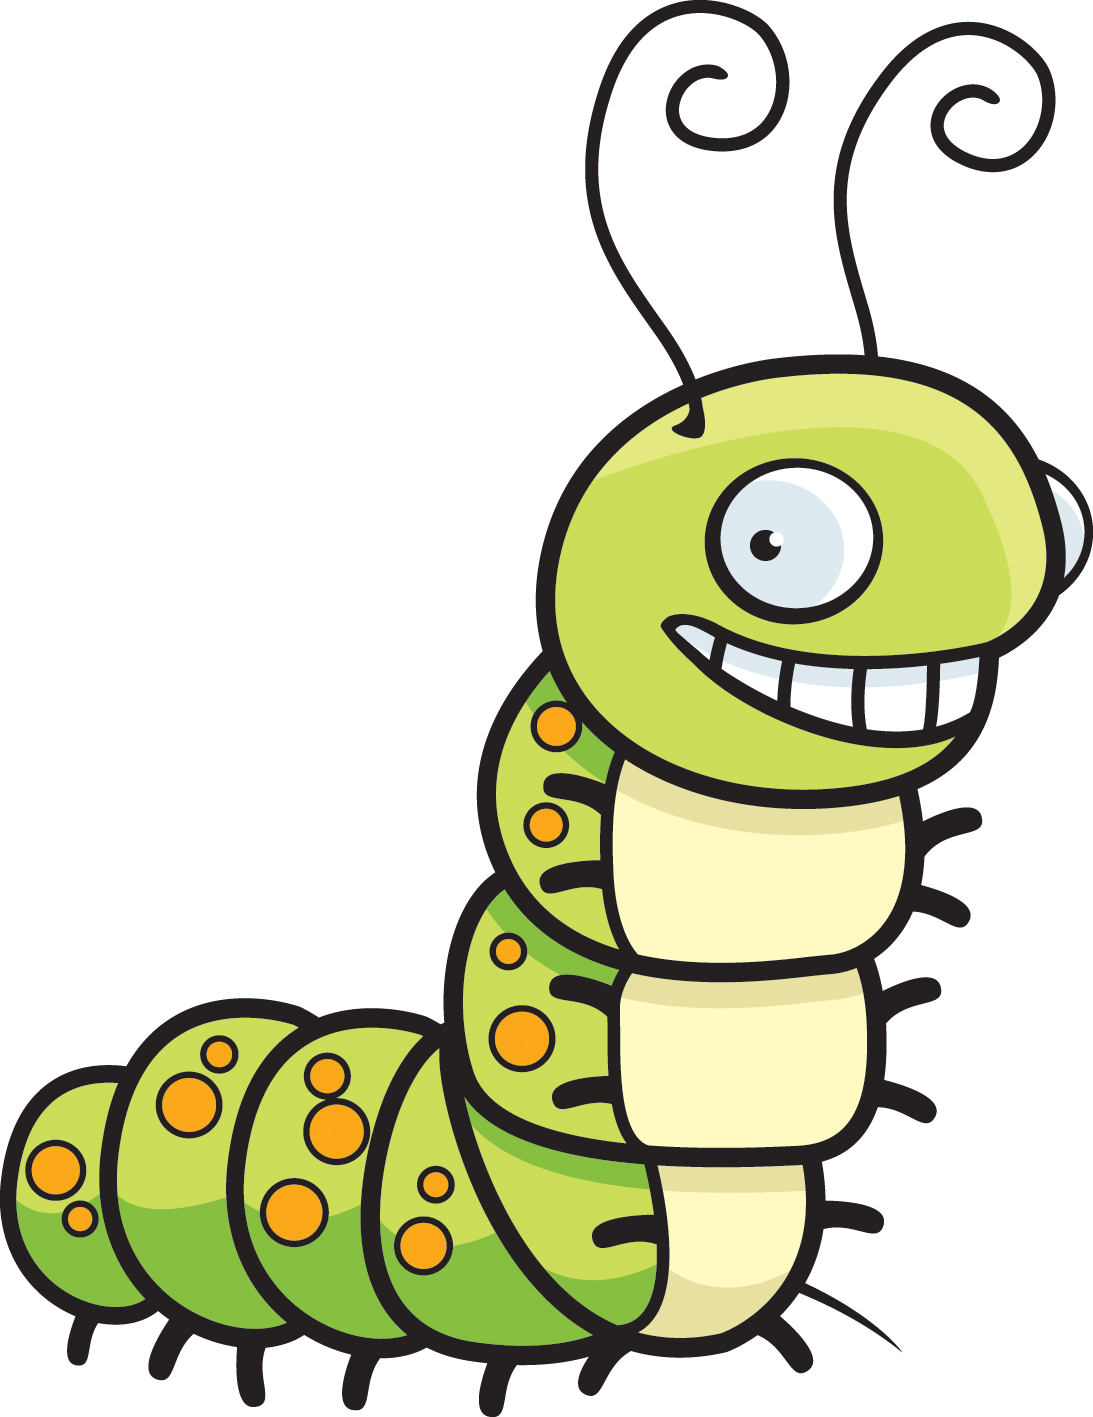 1599 Caterpillar free clipart.